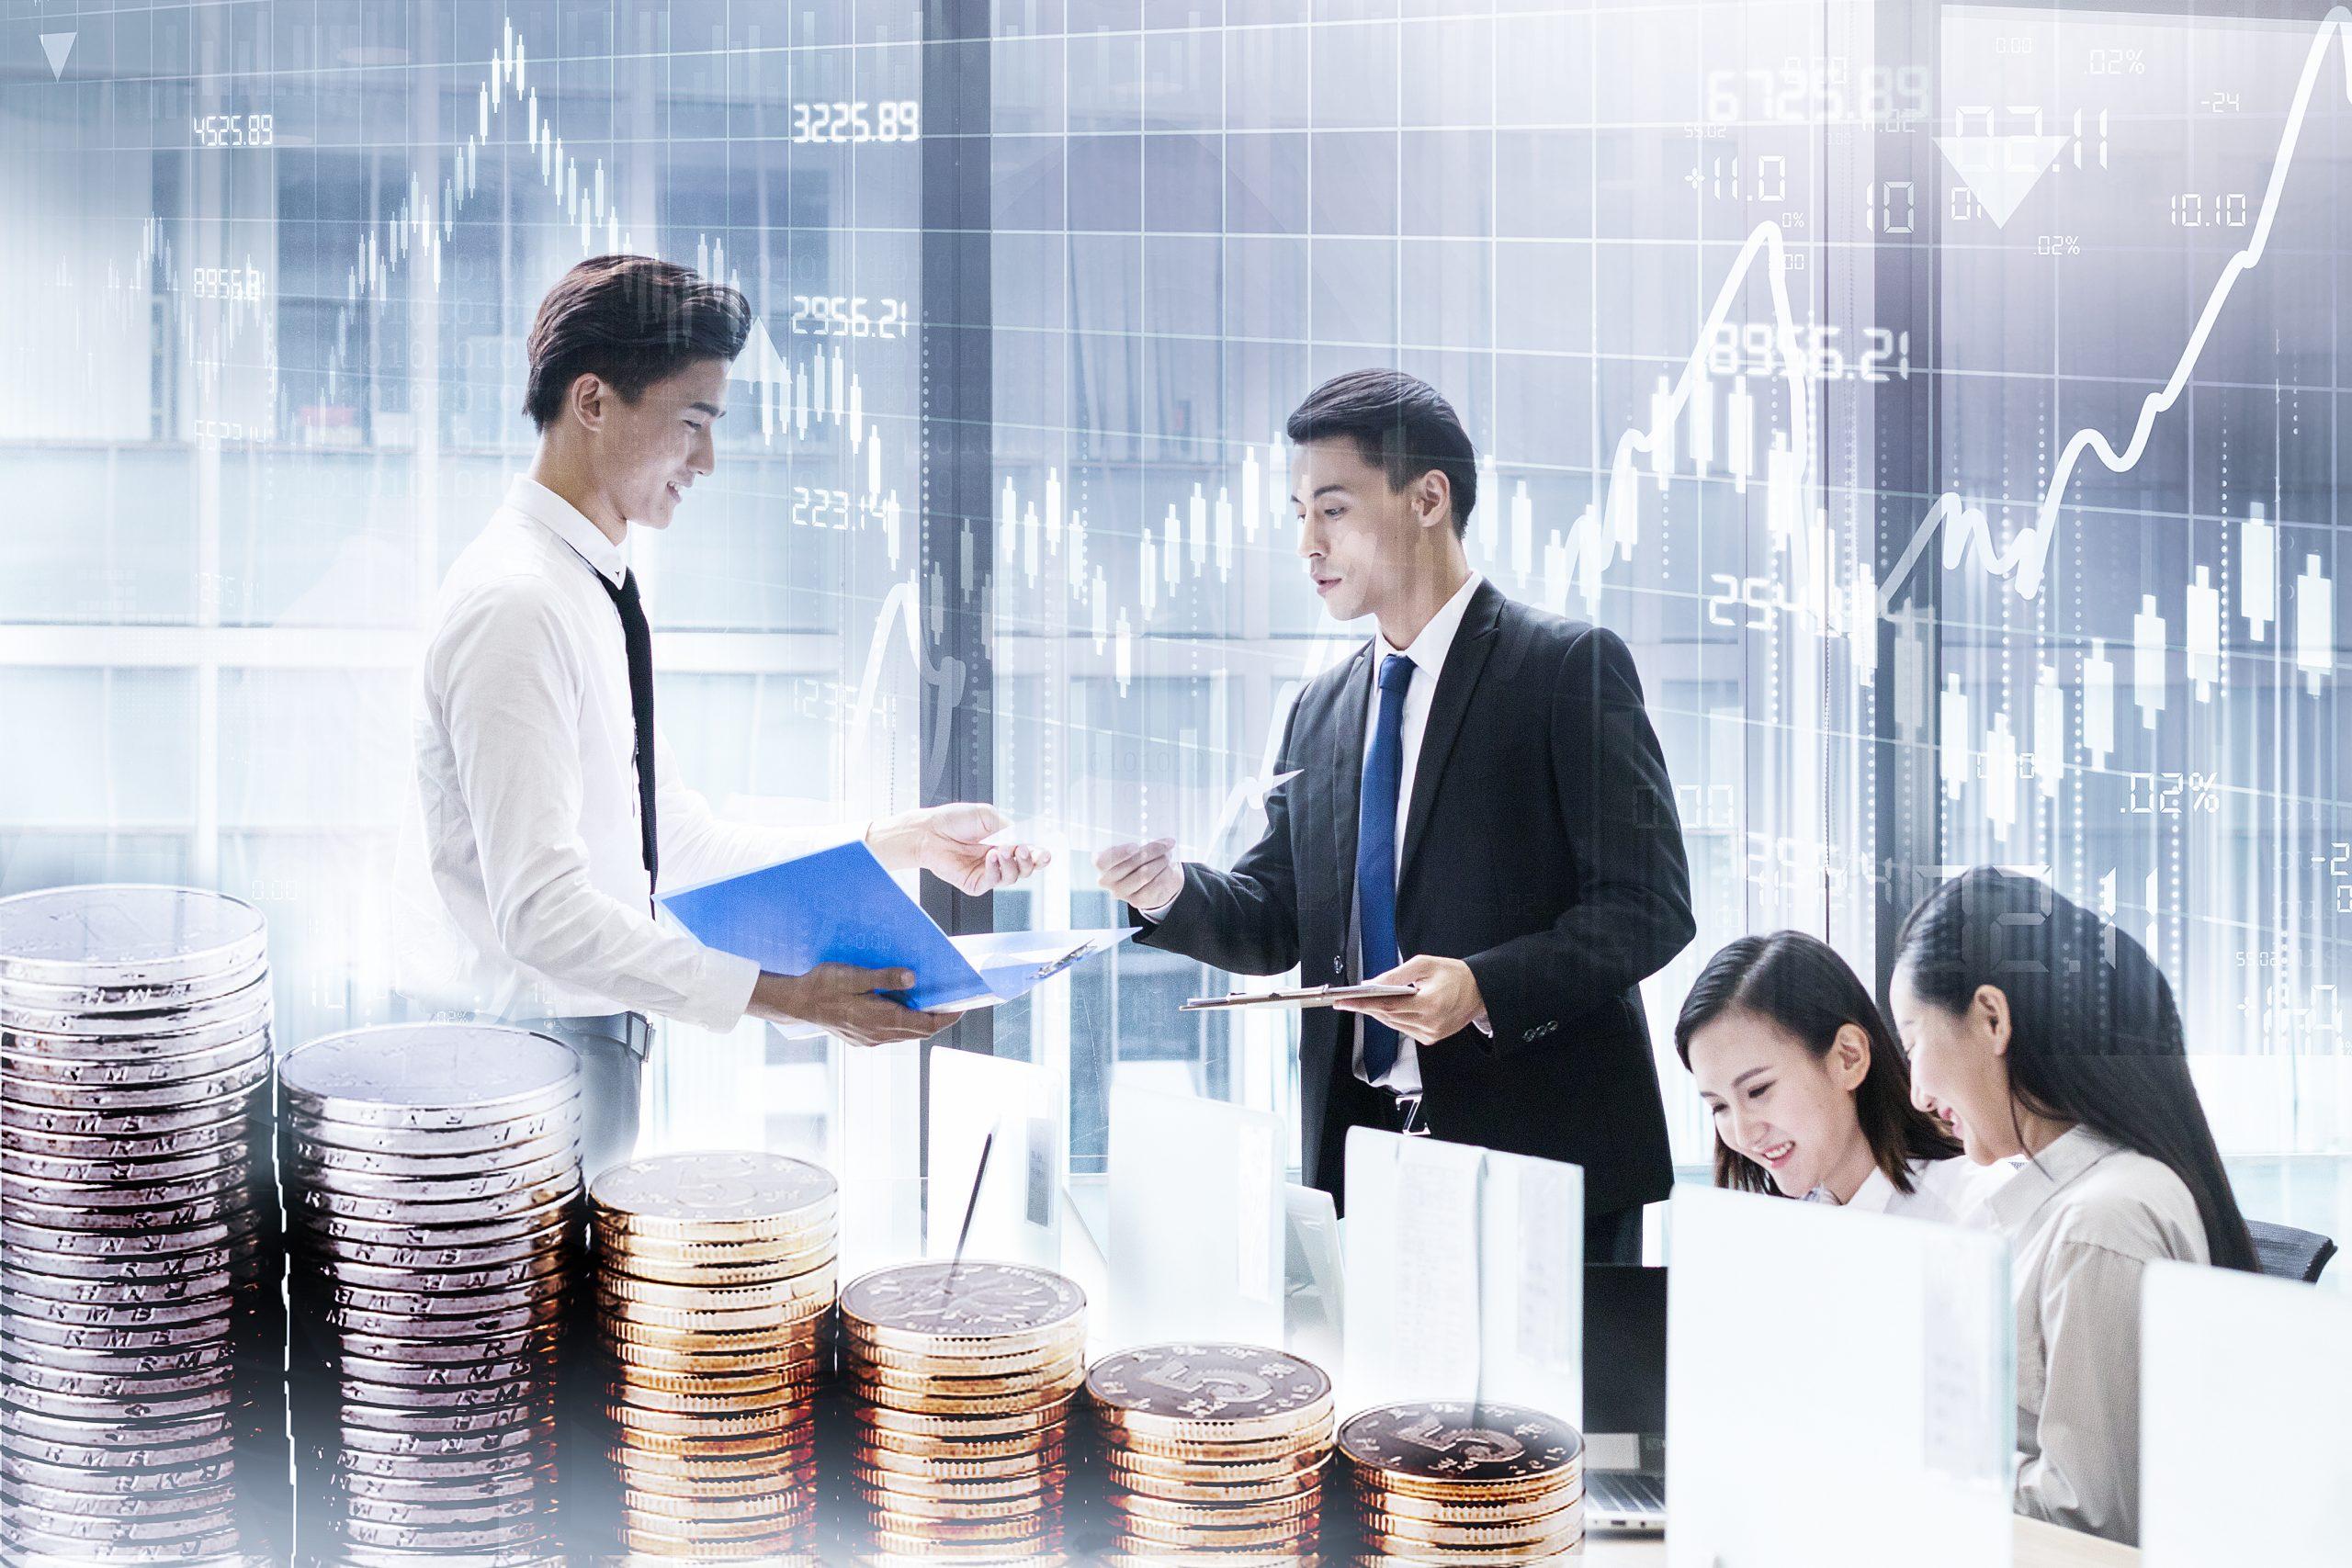 Lovepik_com-401251304-business-finance